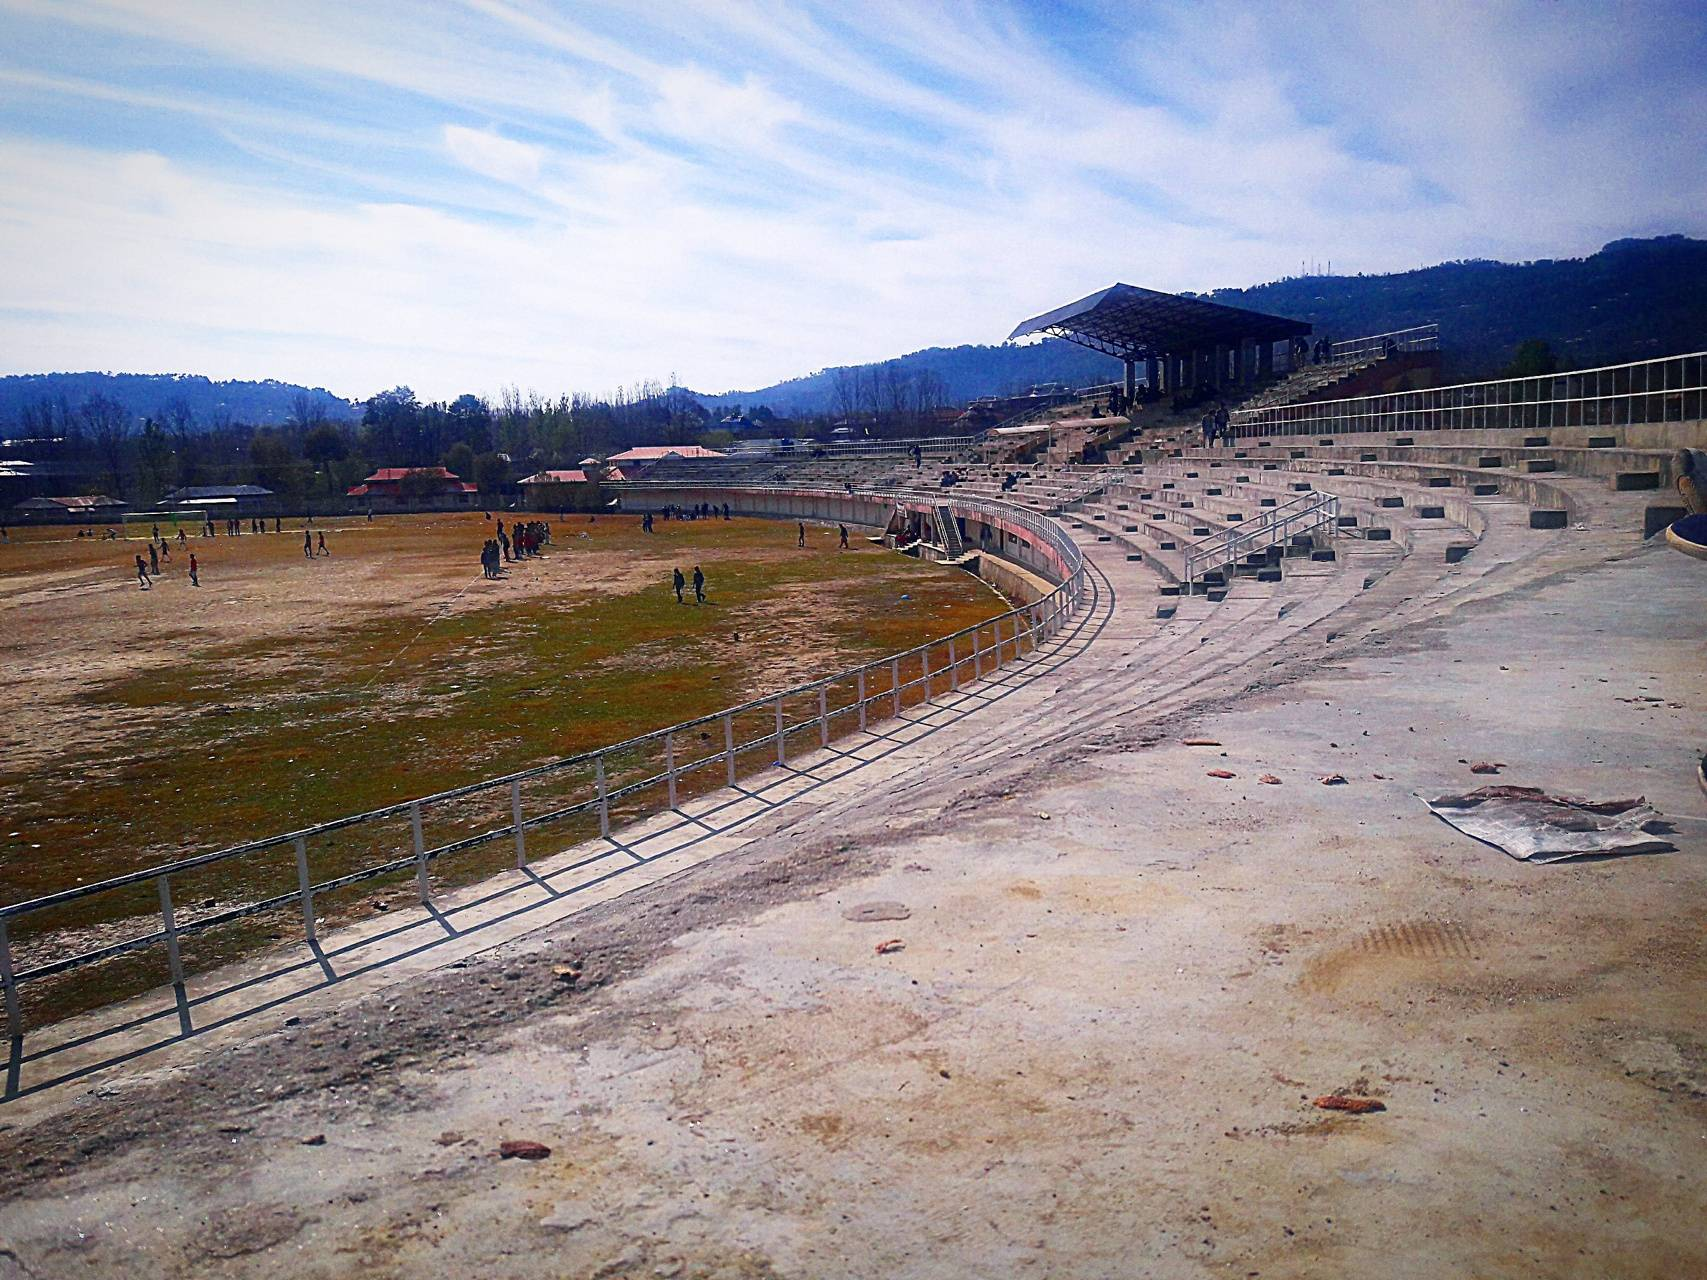 Rawalakot Stadium